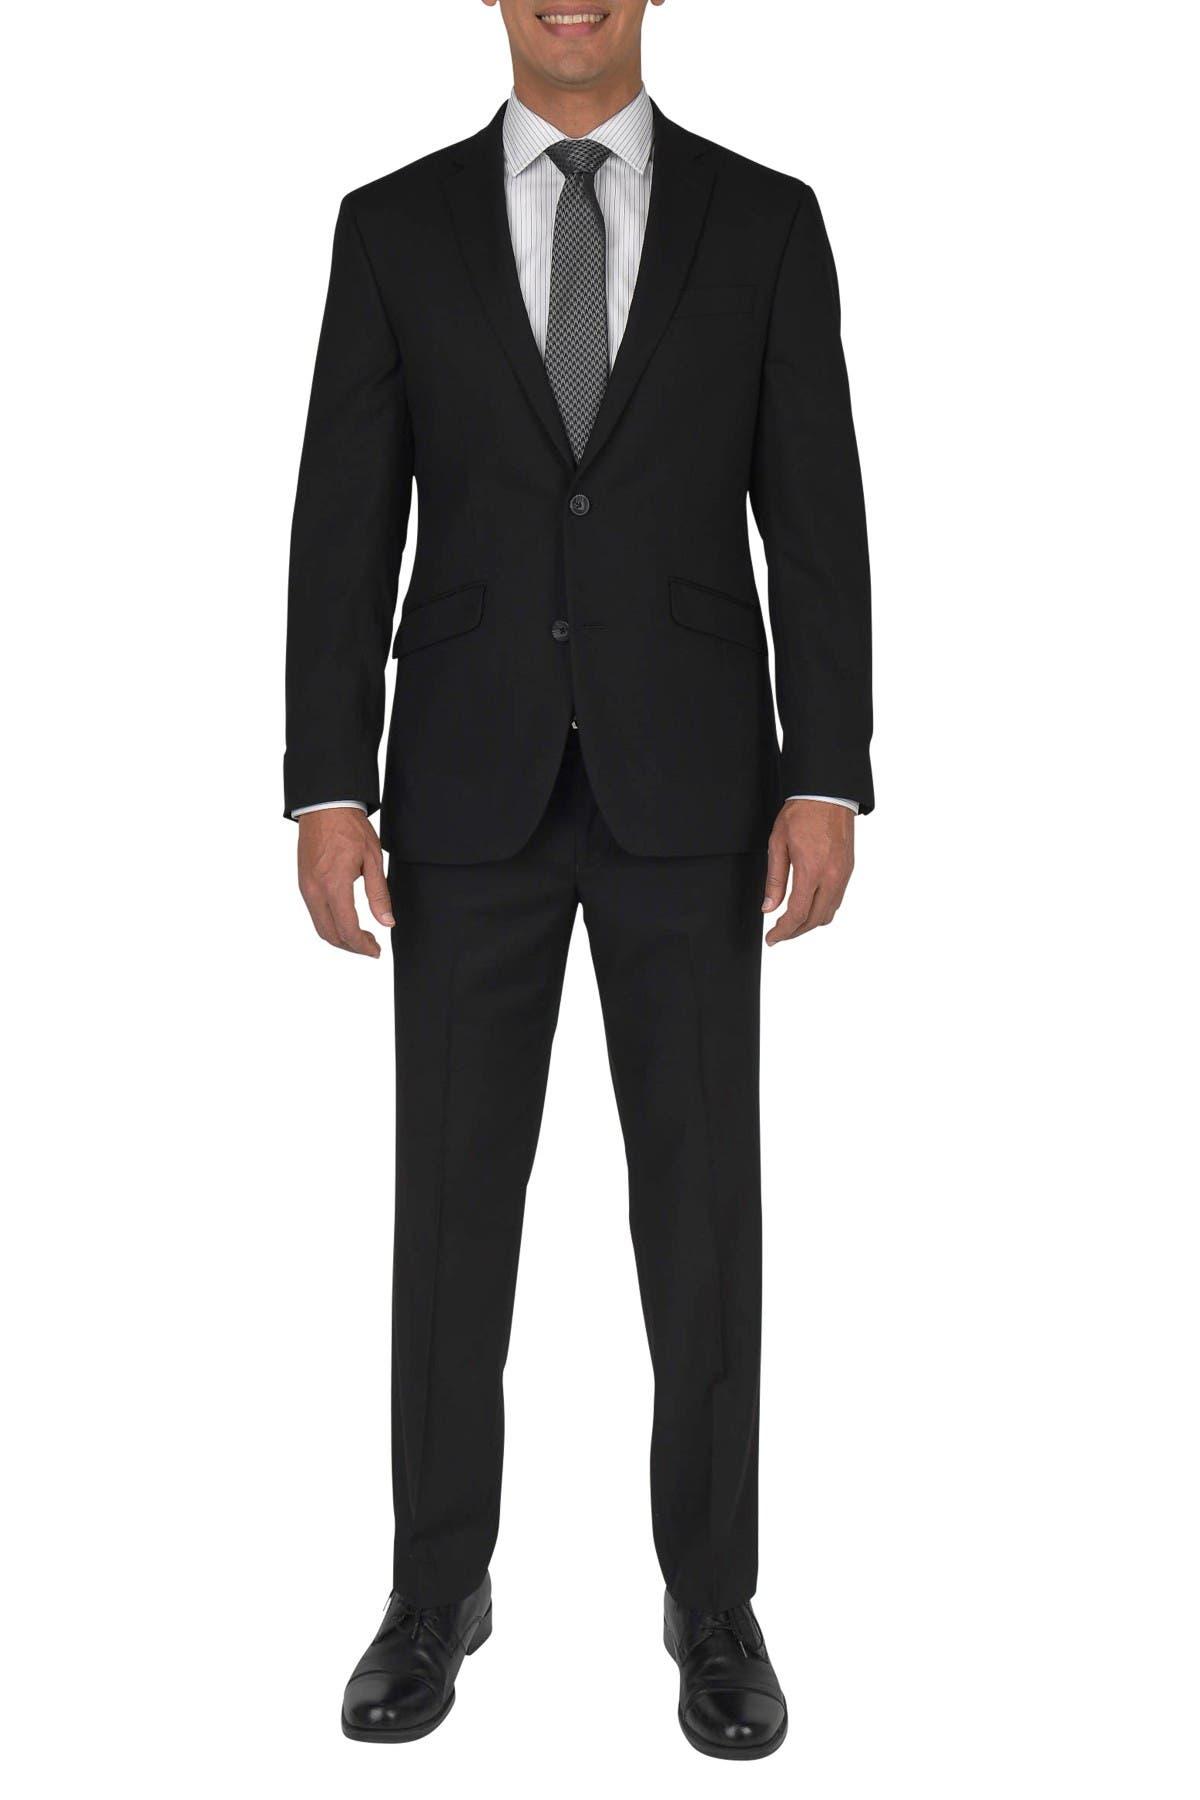 Image of Kenneth Cole Reaction Black Solid Two Button Notch Lapel Techni-Cole Slim Fit Suit